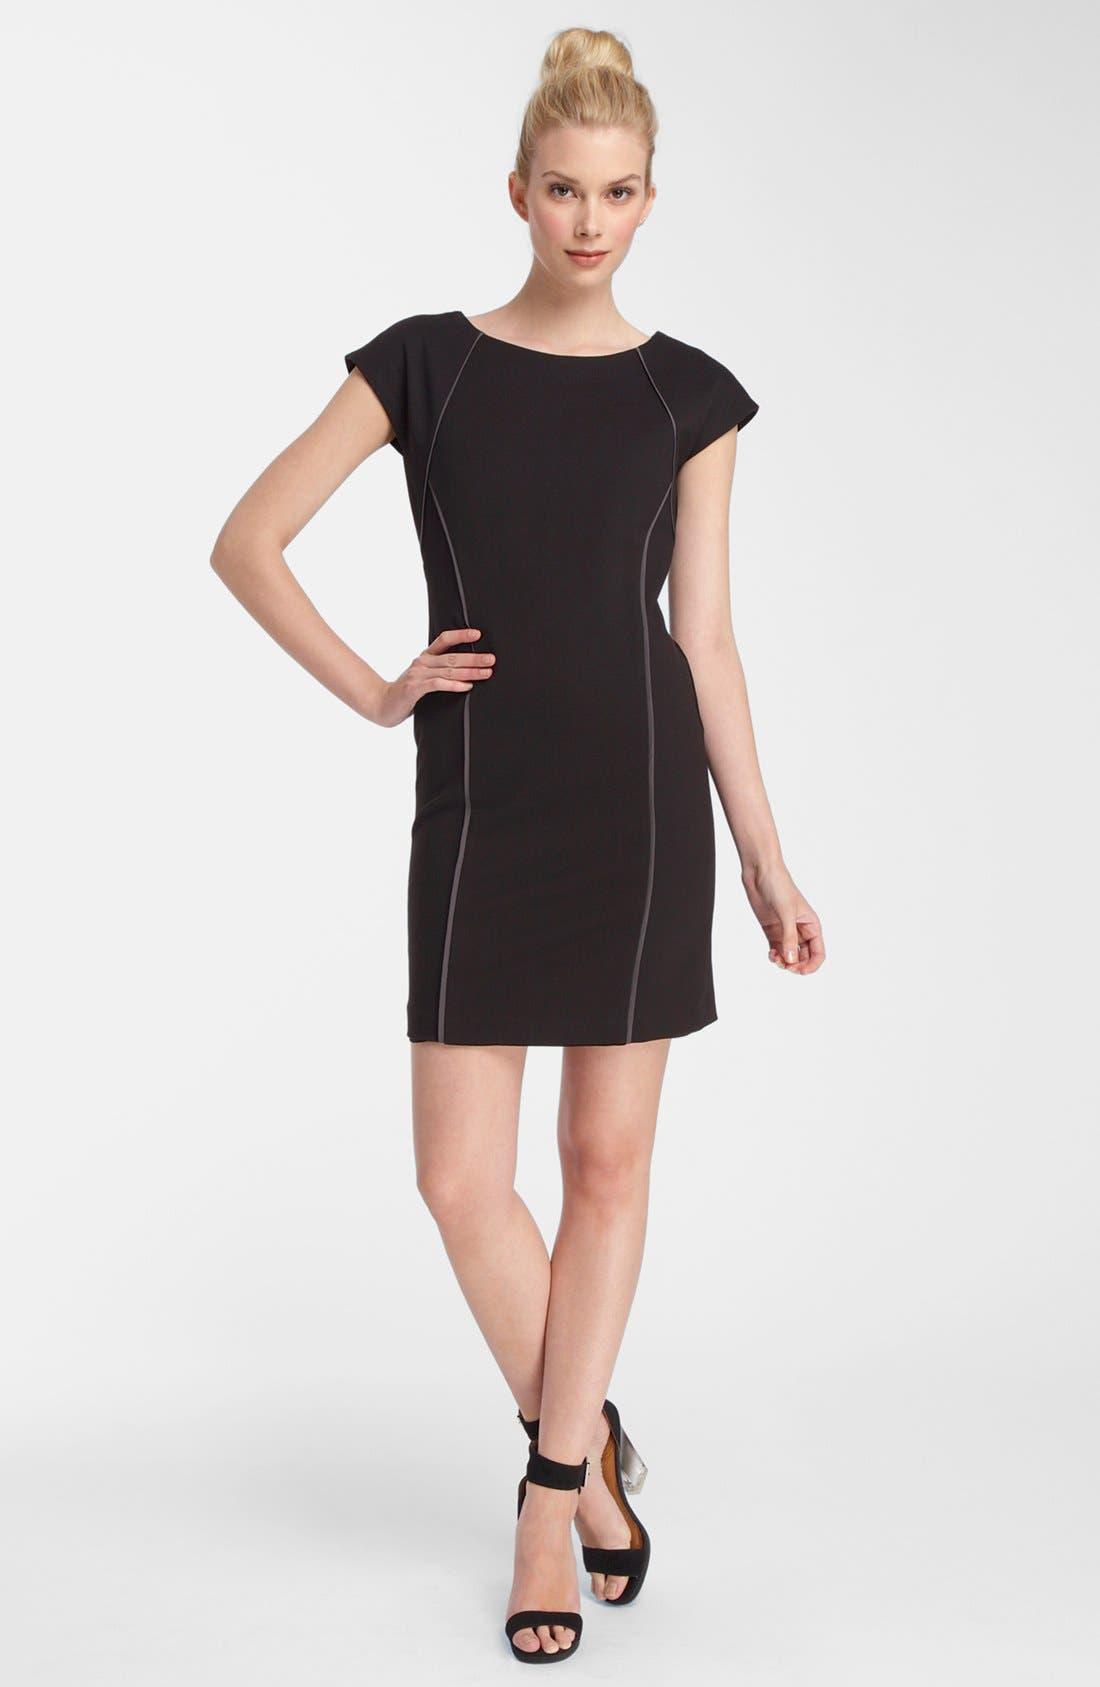 Alternate Image 1 Selected - Catherine Catherine Malandrino Piped Ponte Knit Dress